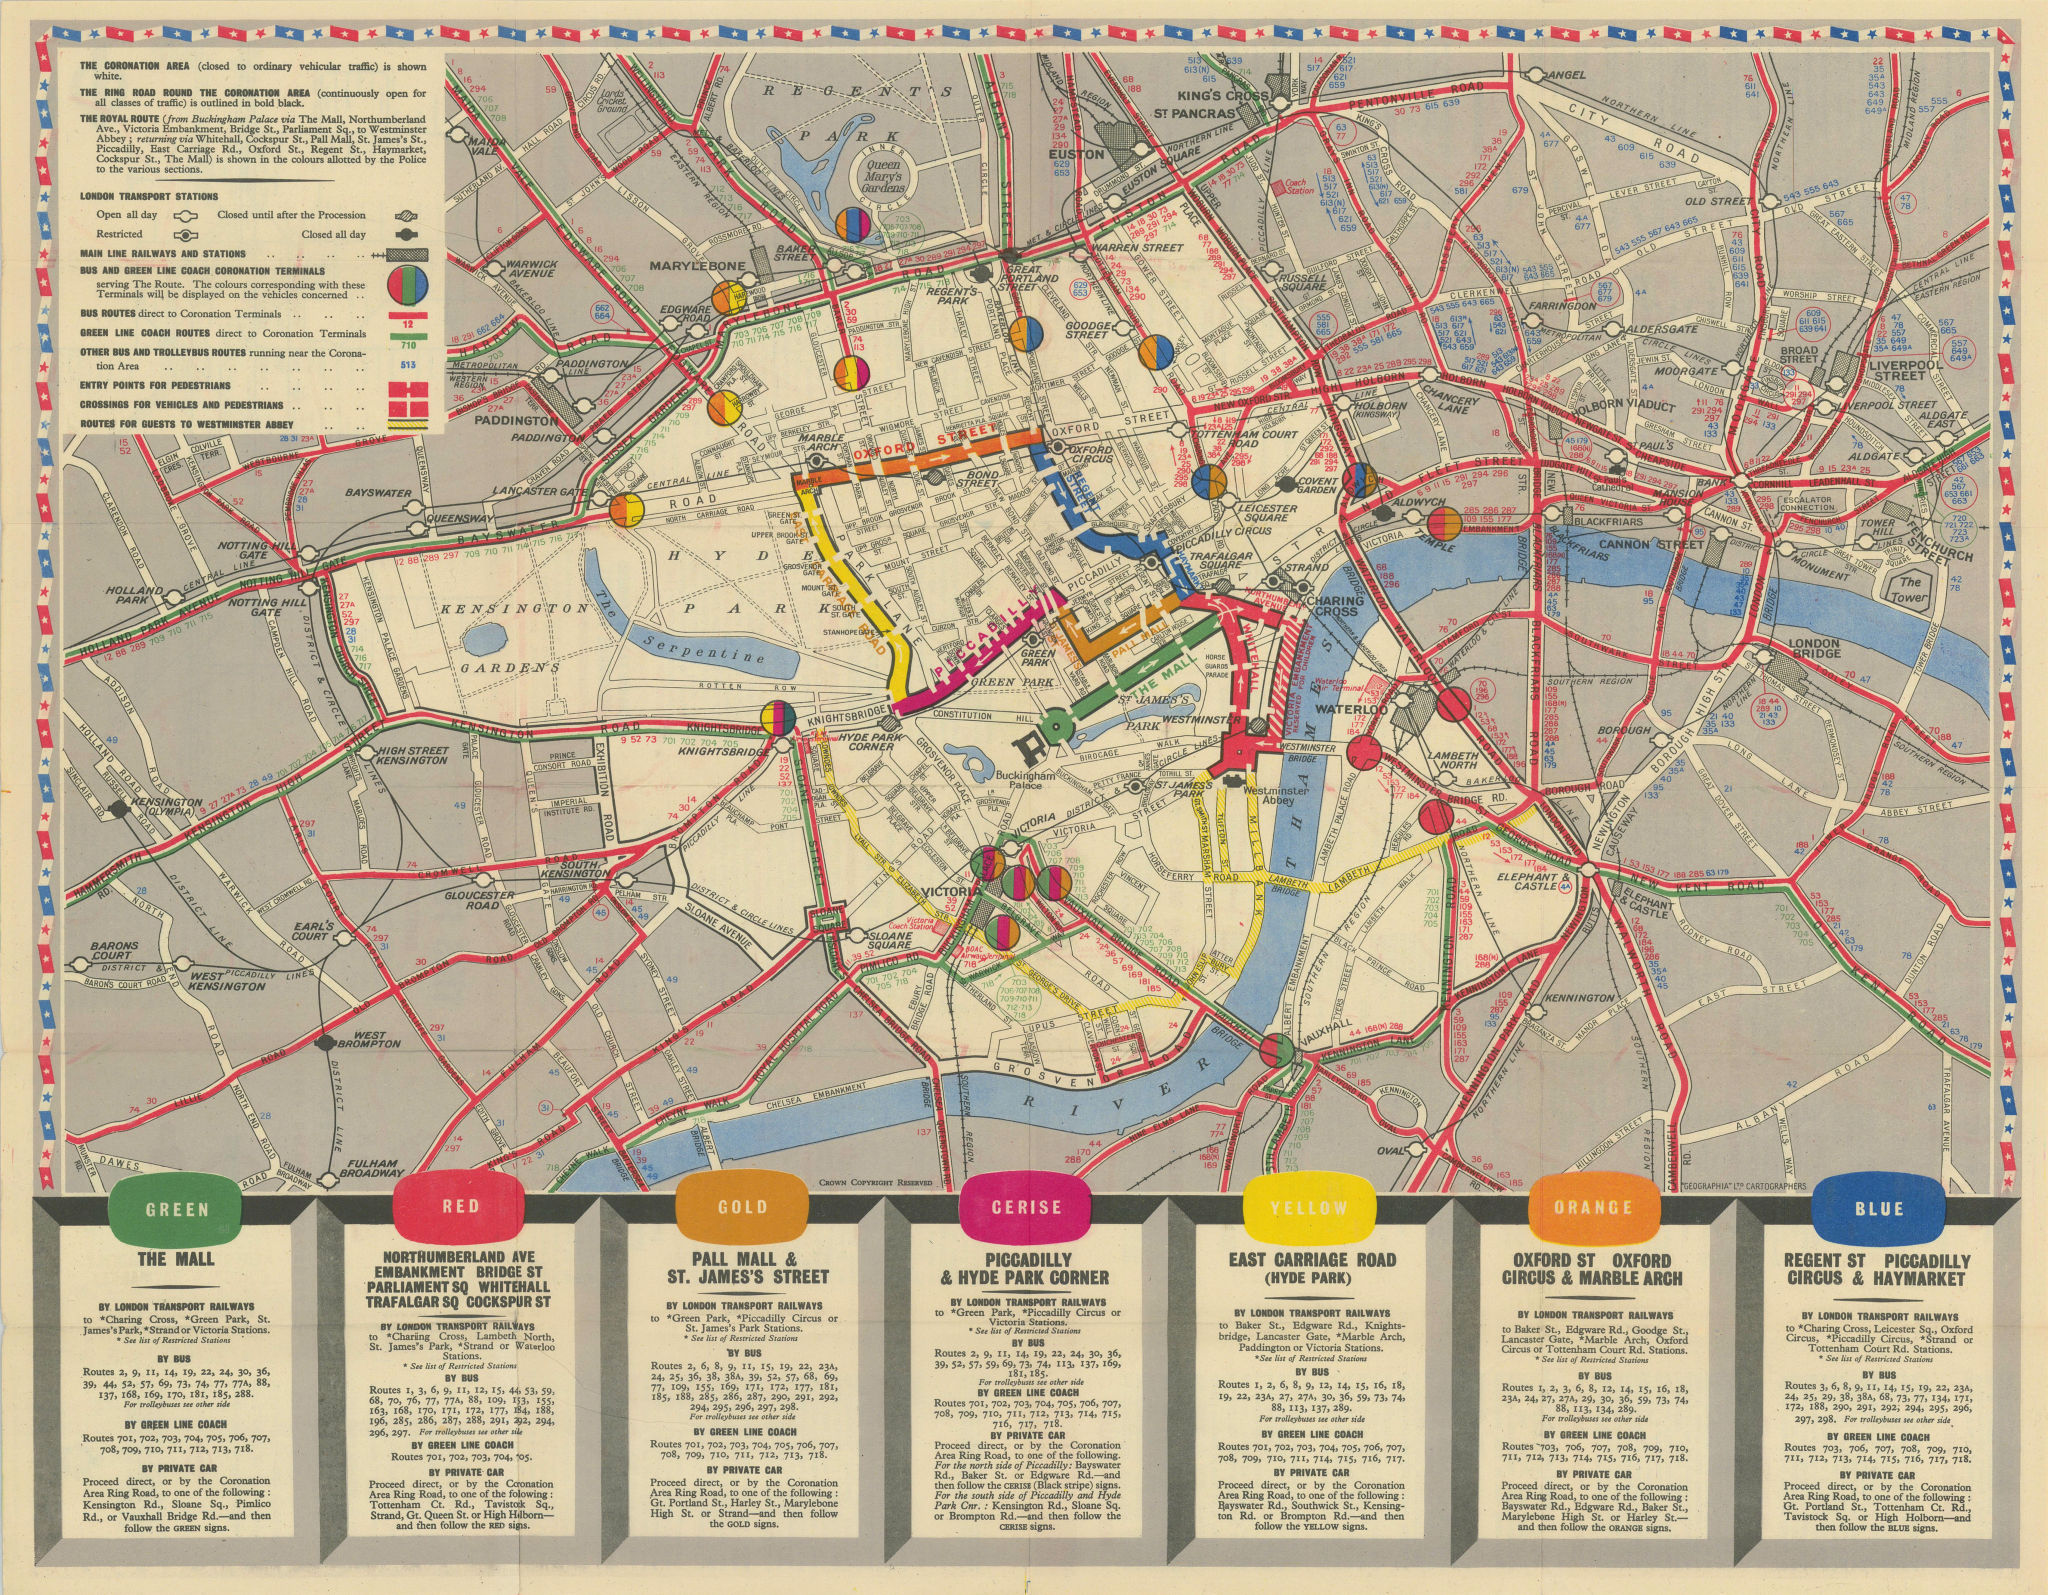 Elizabeth R Coronation. London Transport. British Railways. 2 June 1953 map